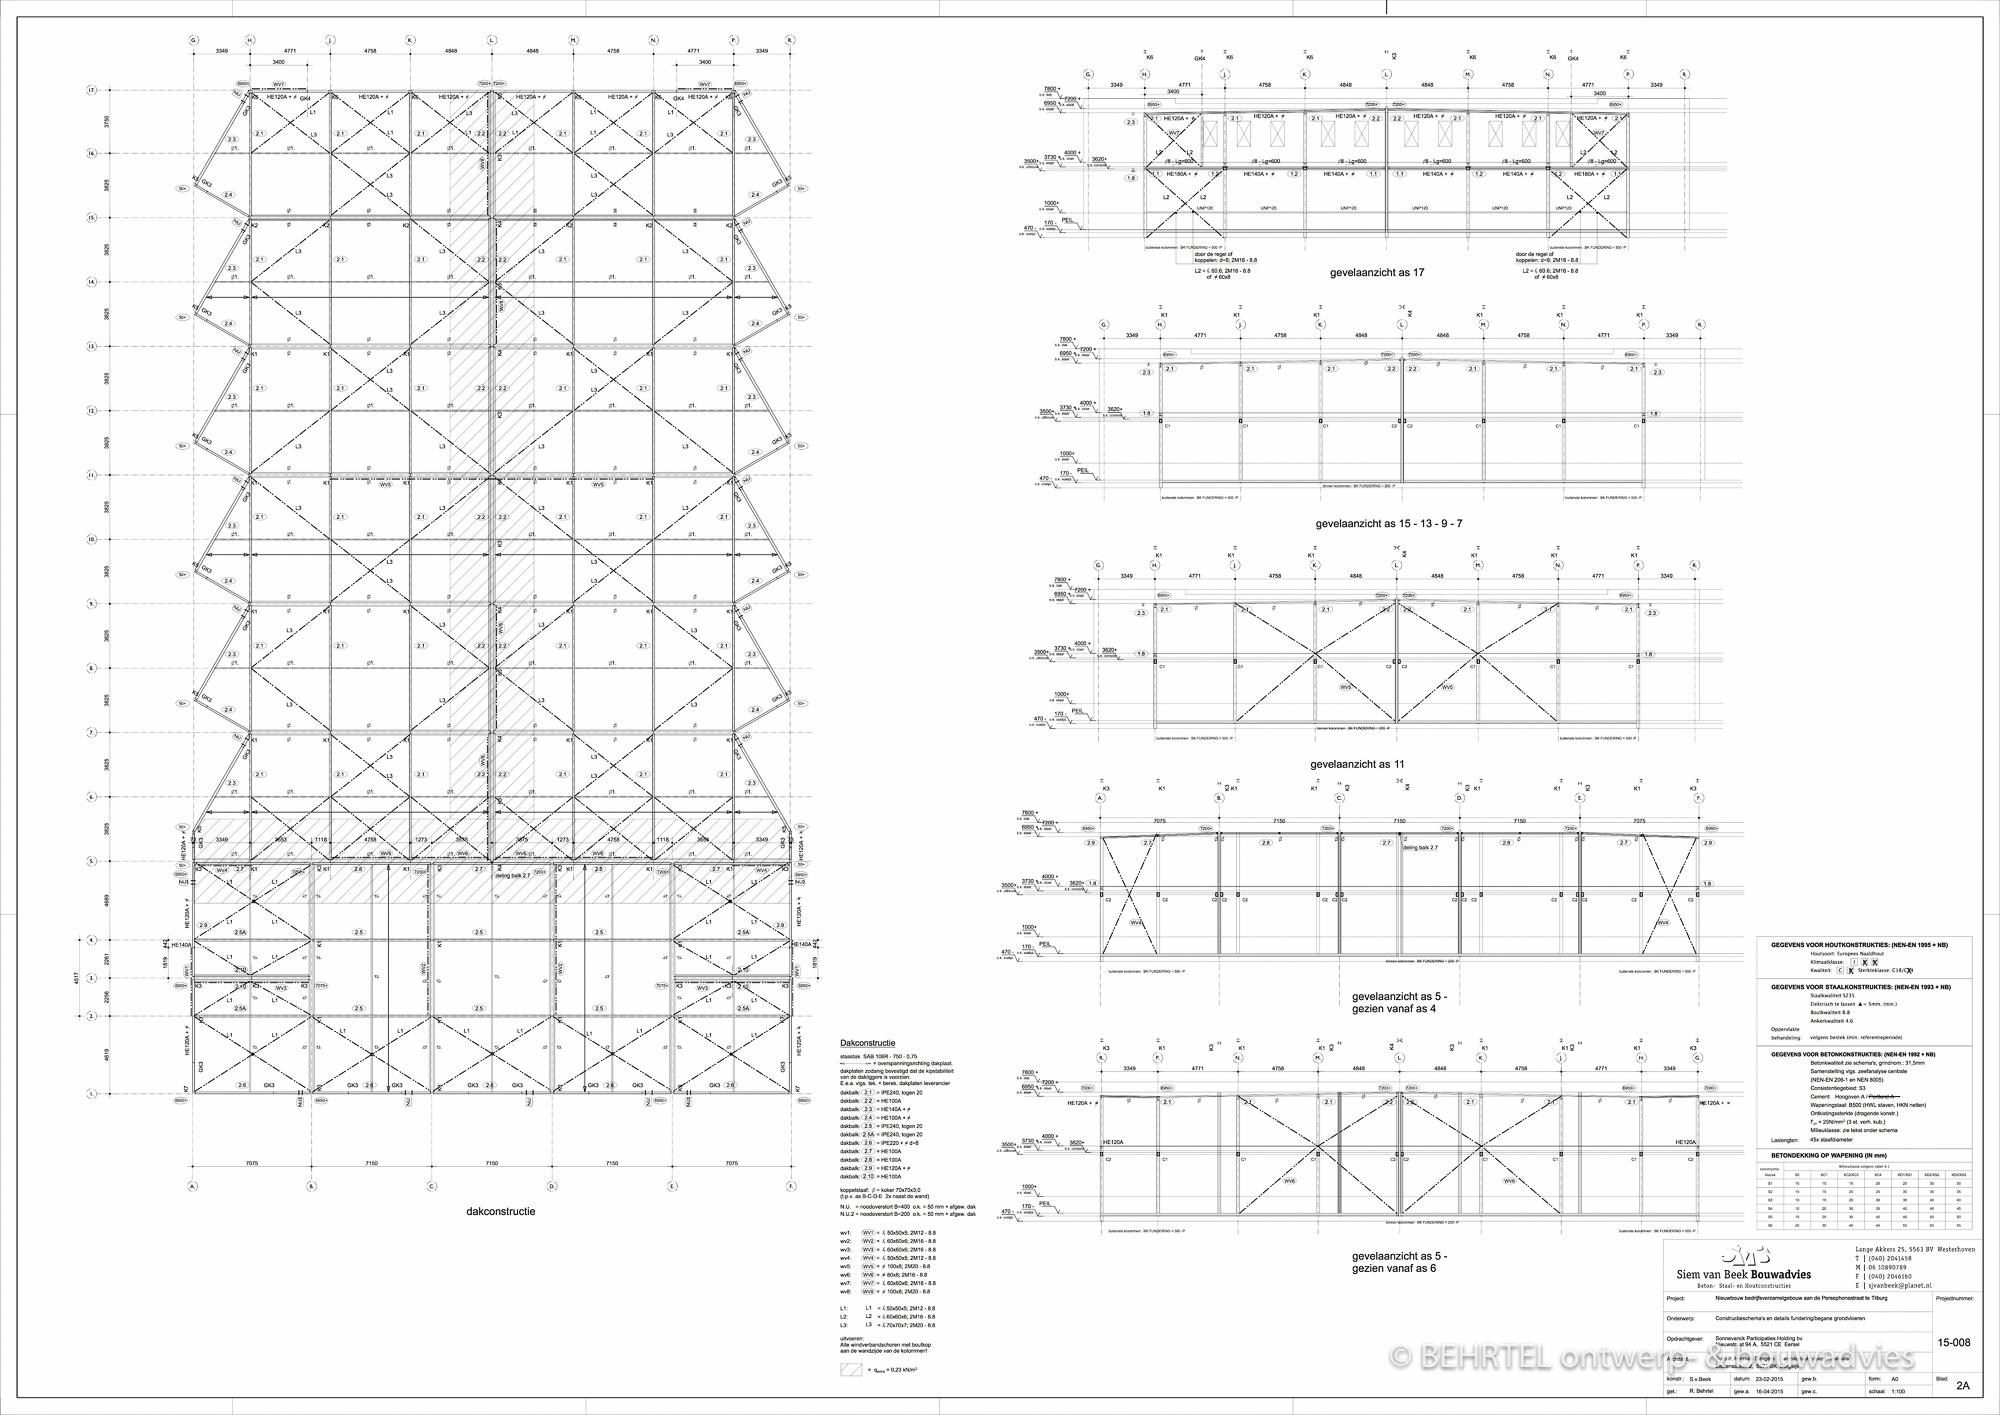 p15-001-constr-tek-editie-a-017